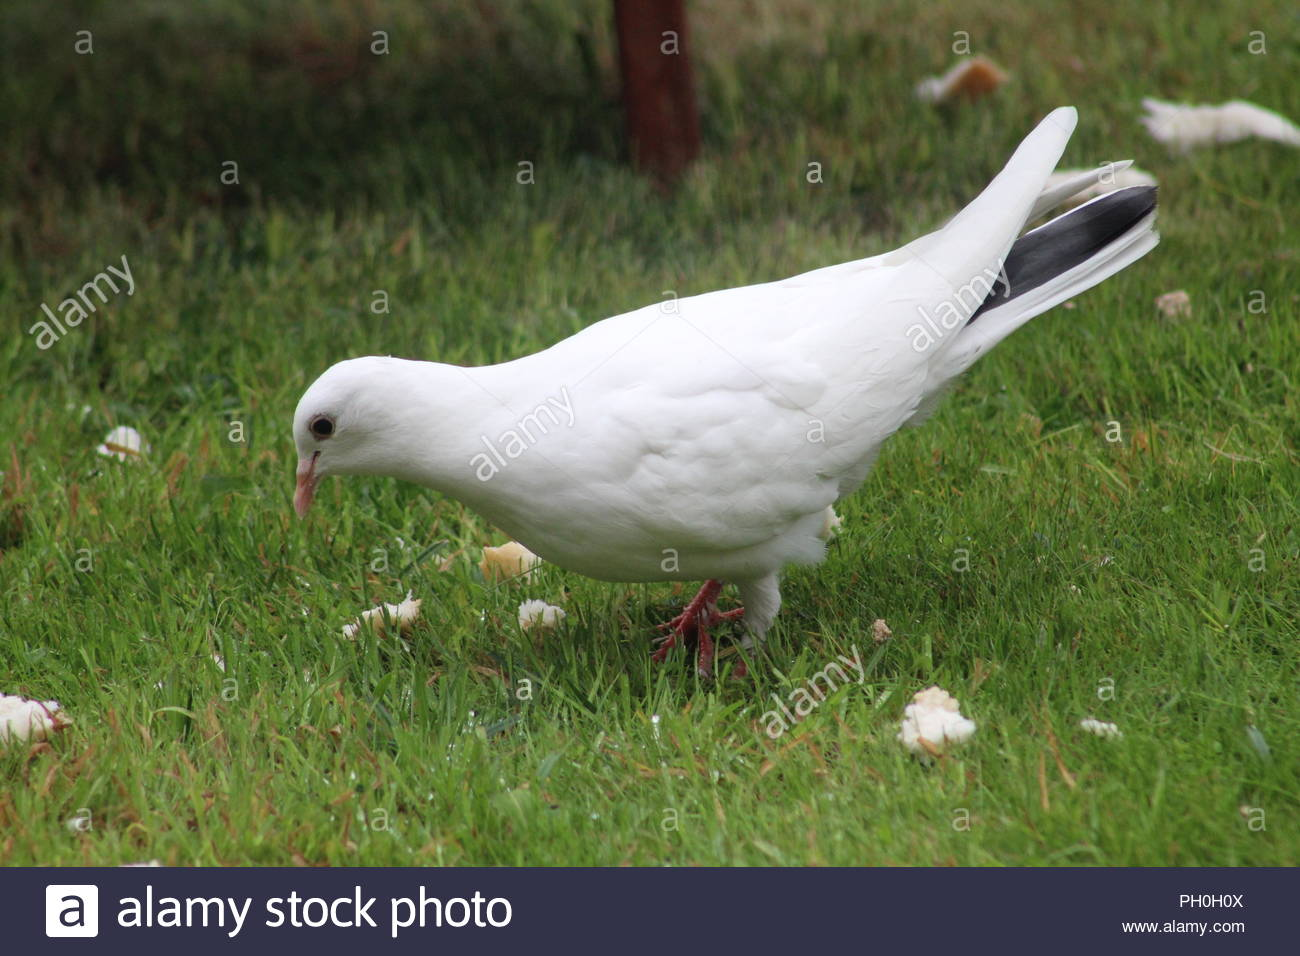 White dove in the Garden - Stock Image